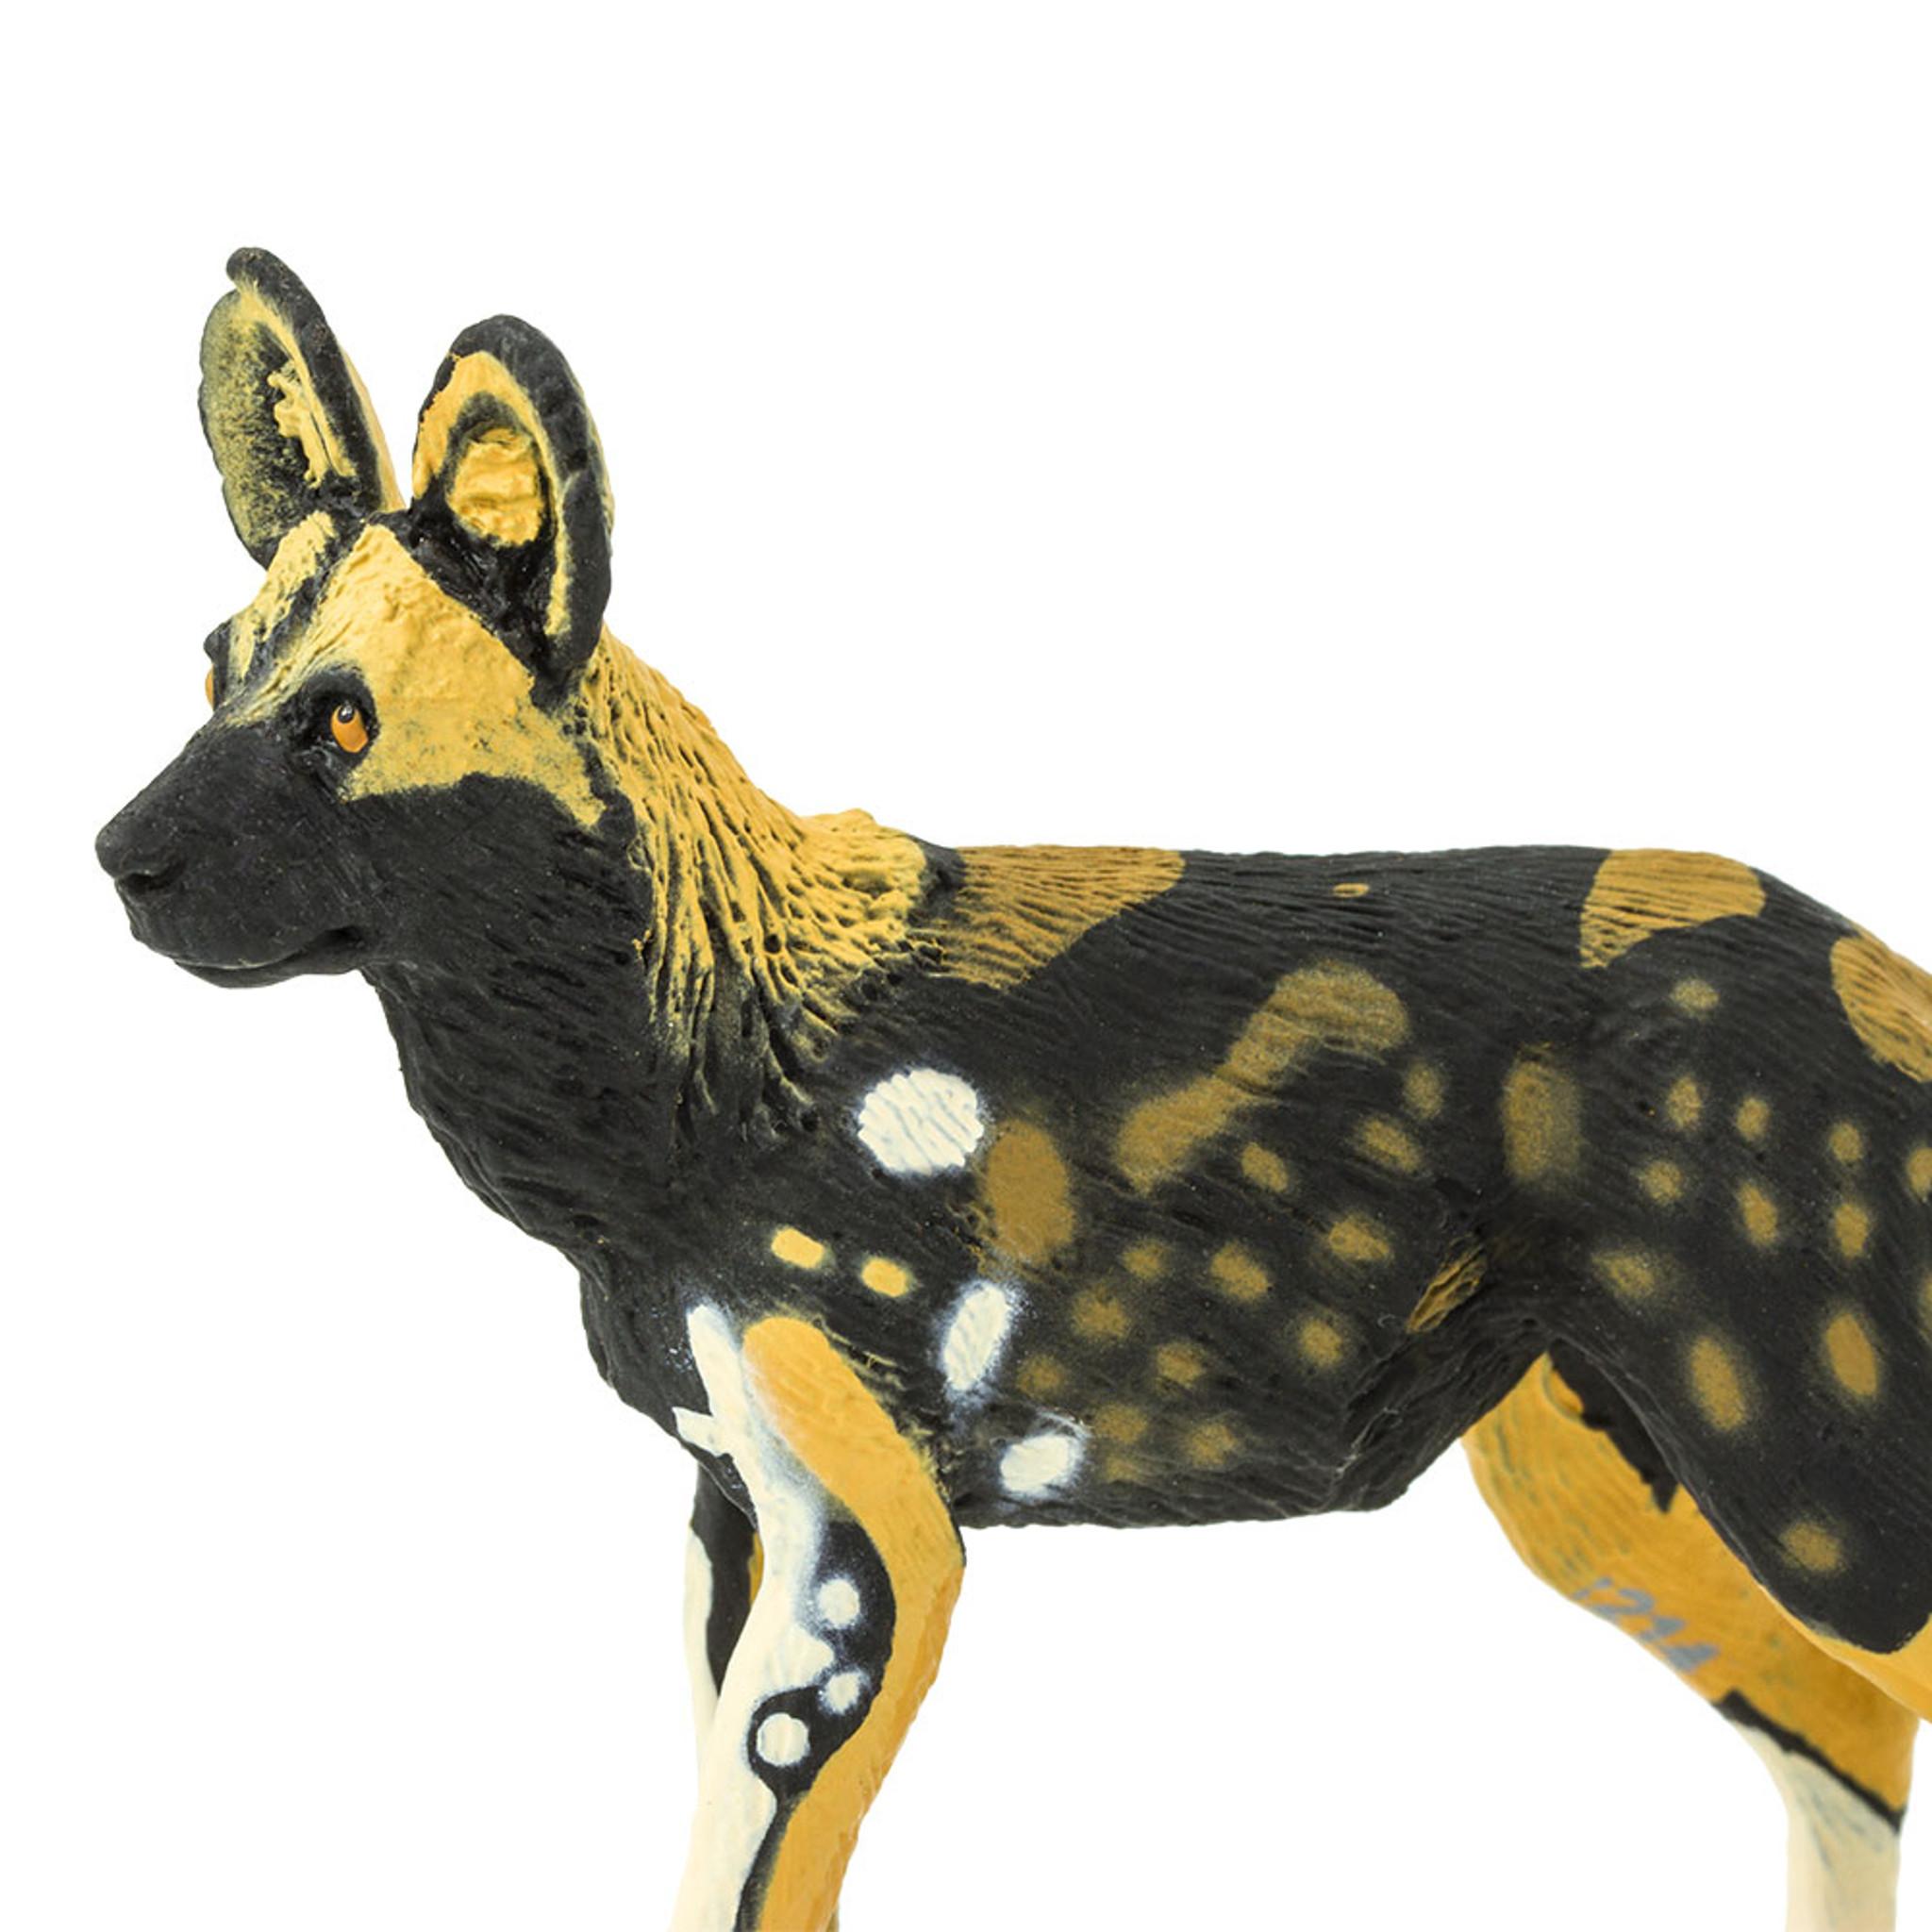 988b48d8609f African Wild Dog - MiniZoo